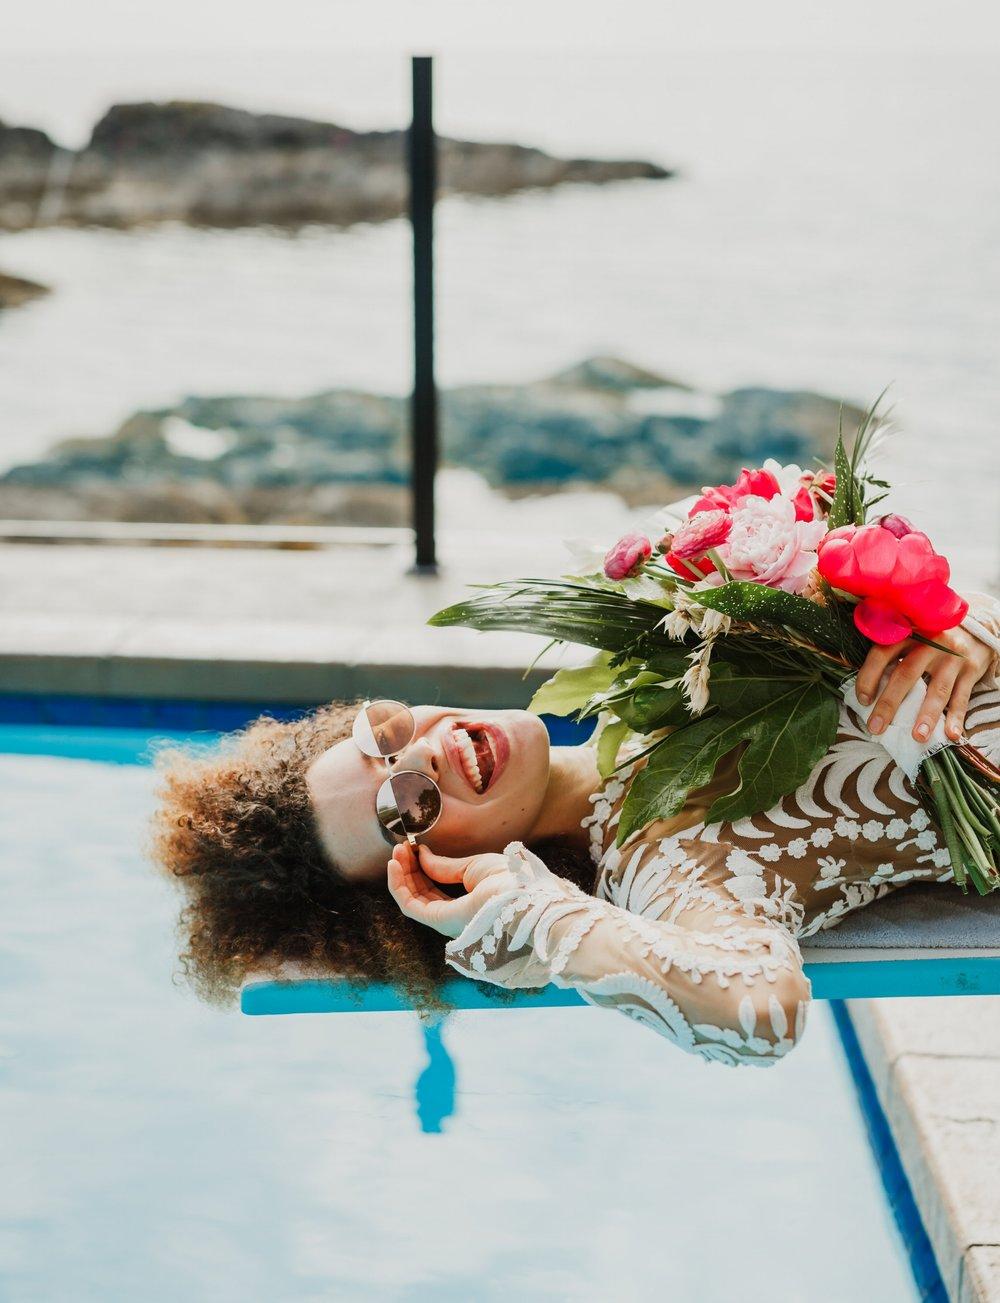 West Coast Bride - Vancouver Wedding Photographer & Videographer - Sunshine Coast Wedding Photos - Sunshine Coast Wedding Photographer - Jennifer Picard Photography - IMG_6527.jpg